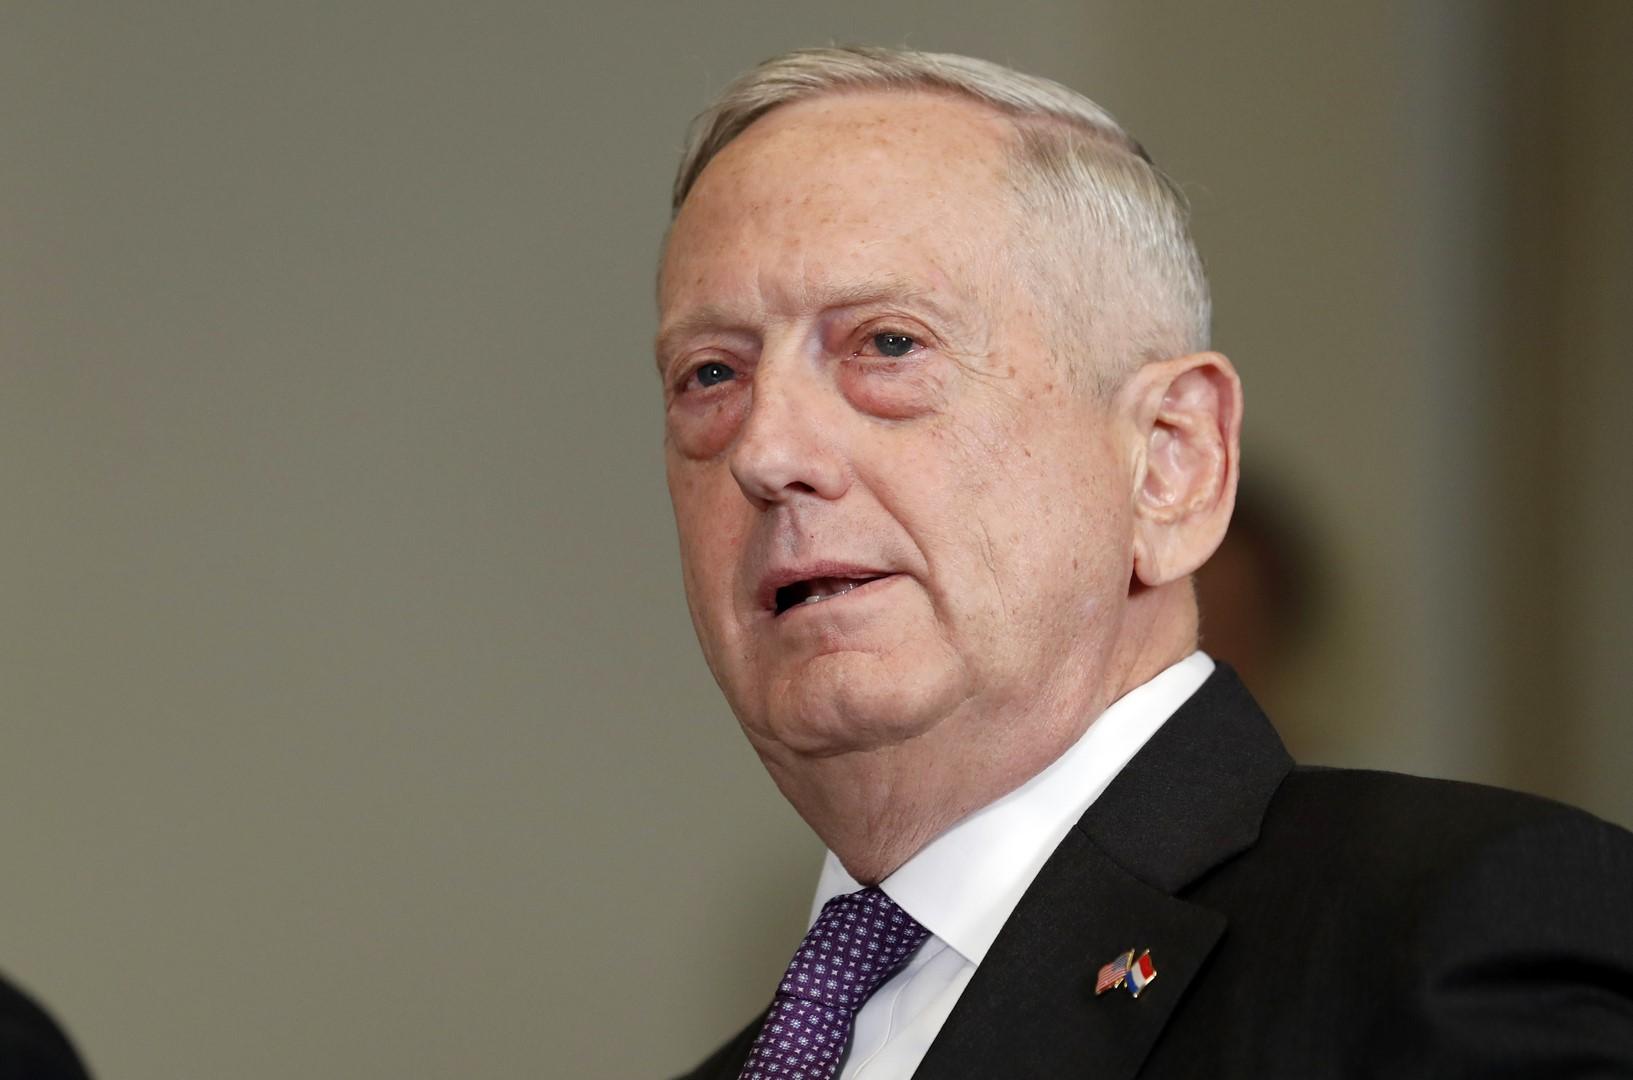 El secretario de Defensa de EU Jim Mattis